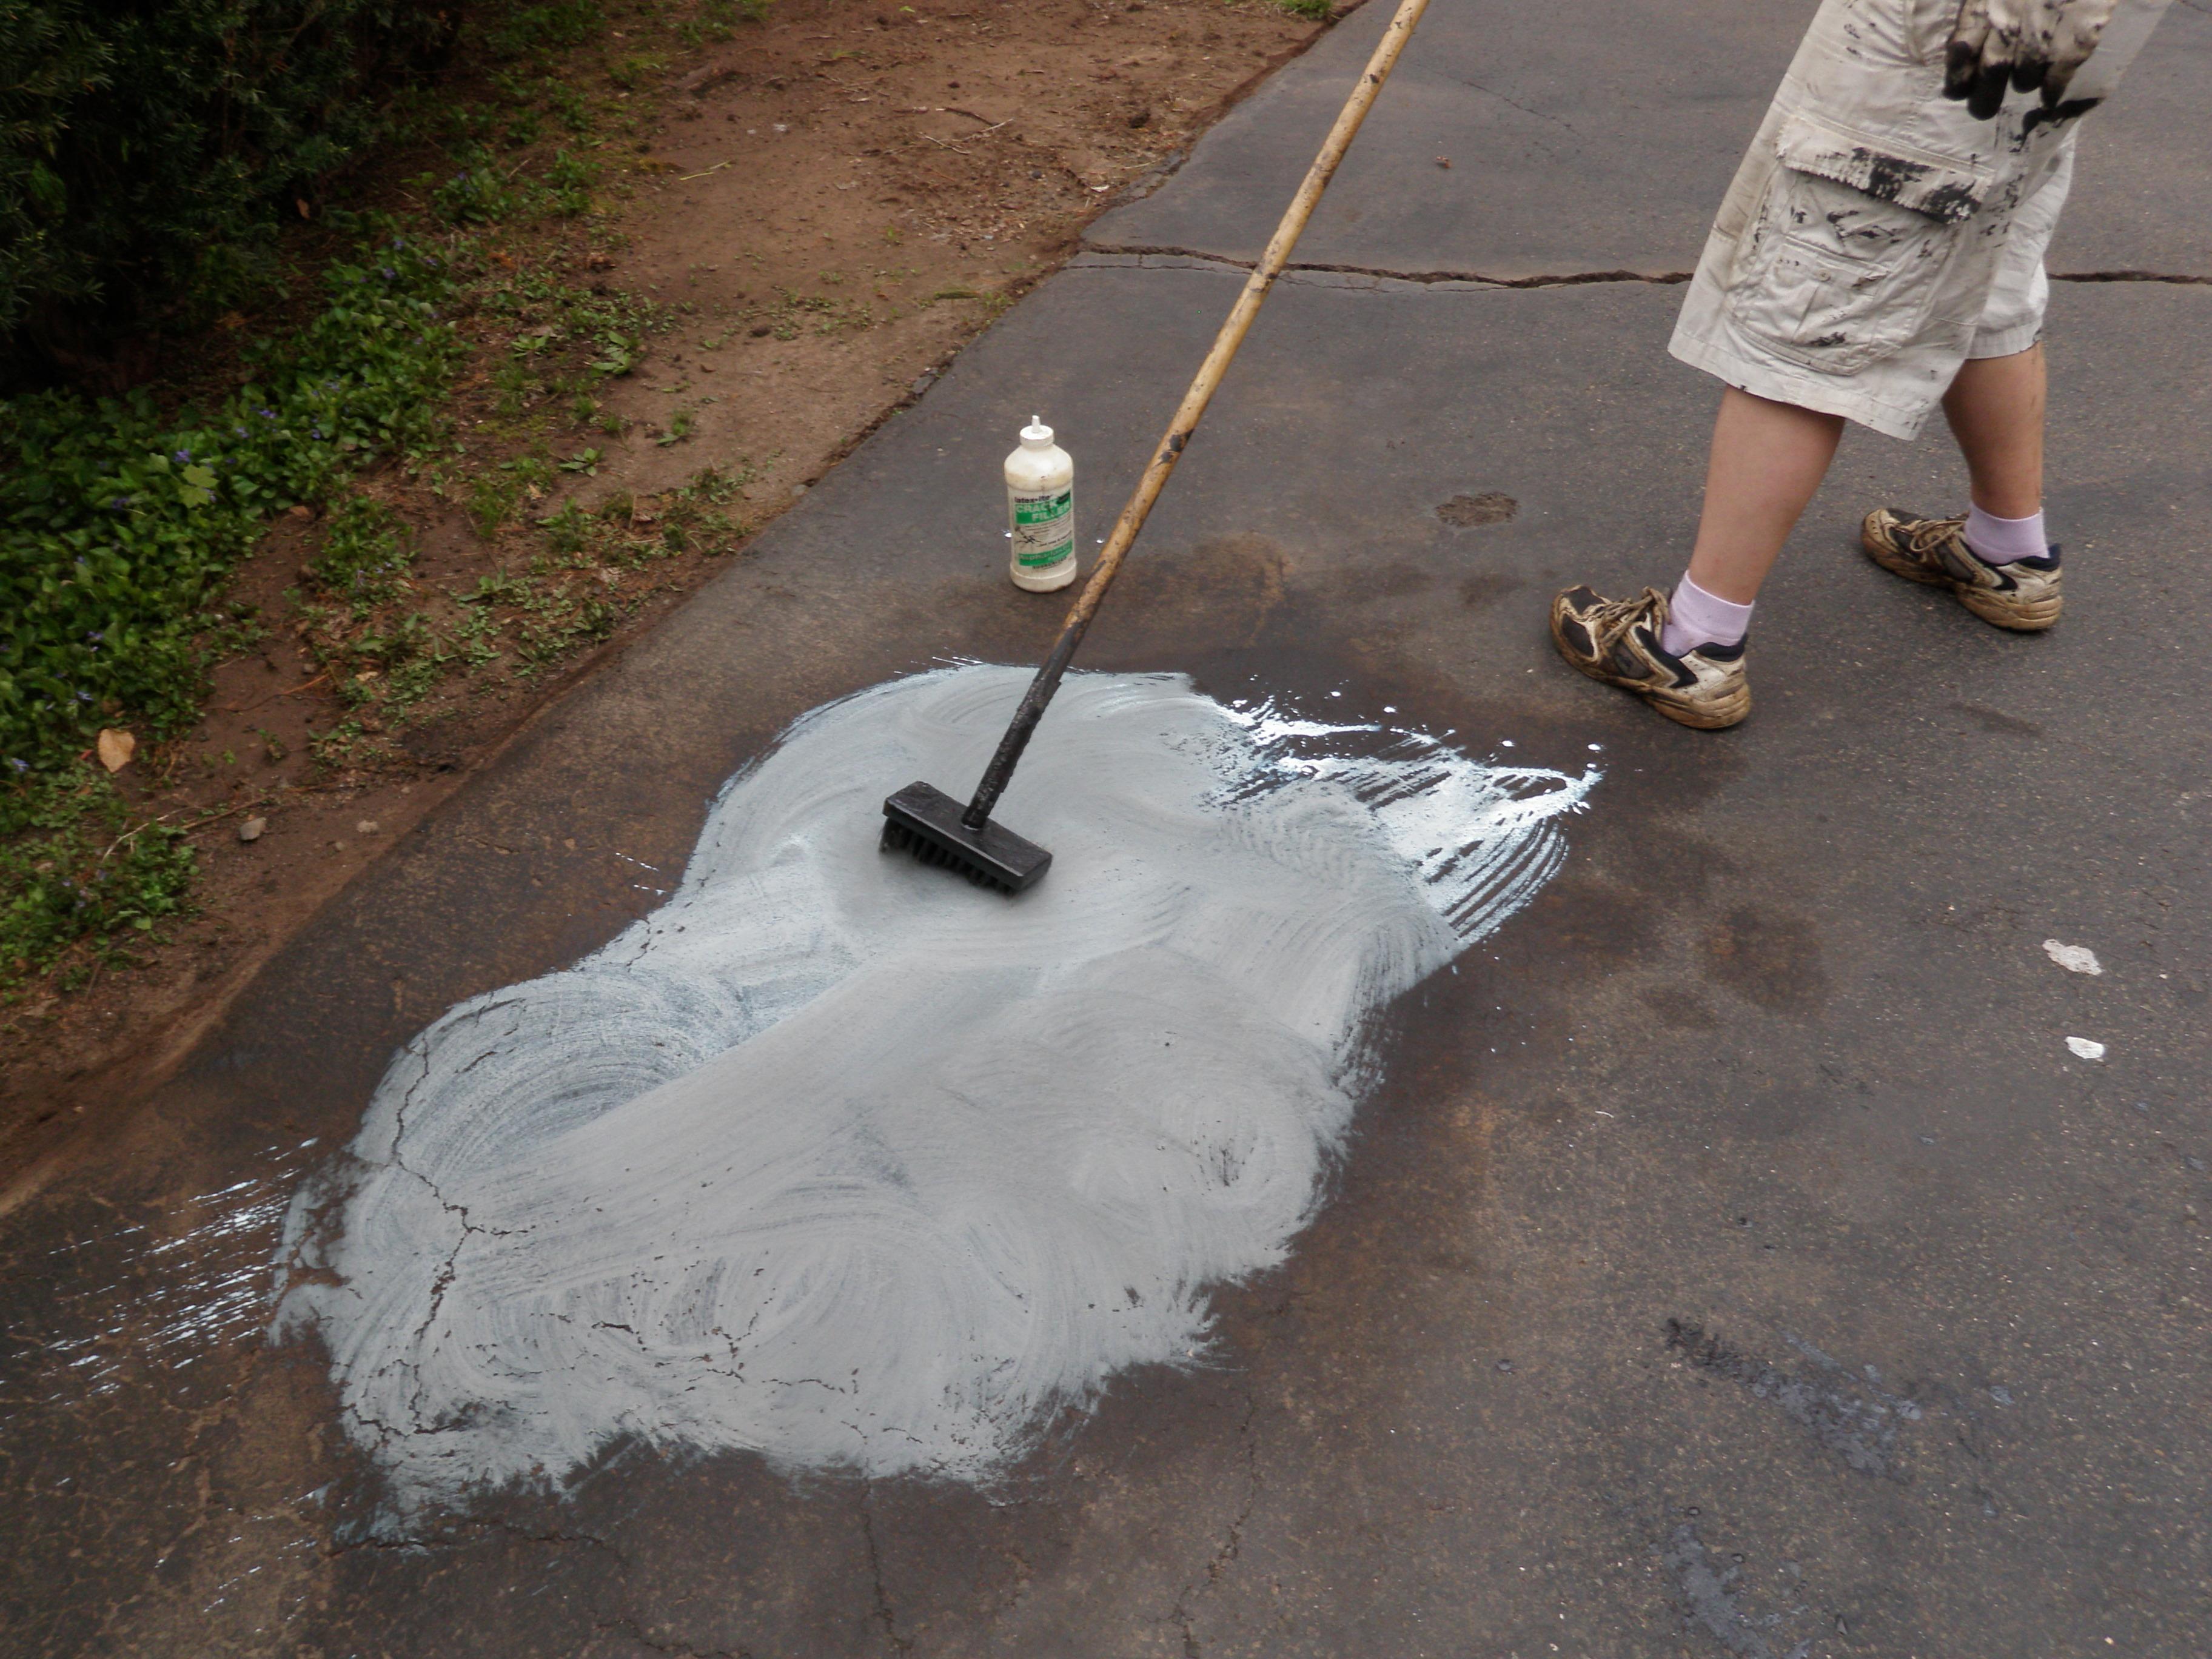 Scrubbing Driveway with Brush